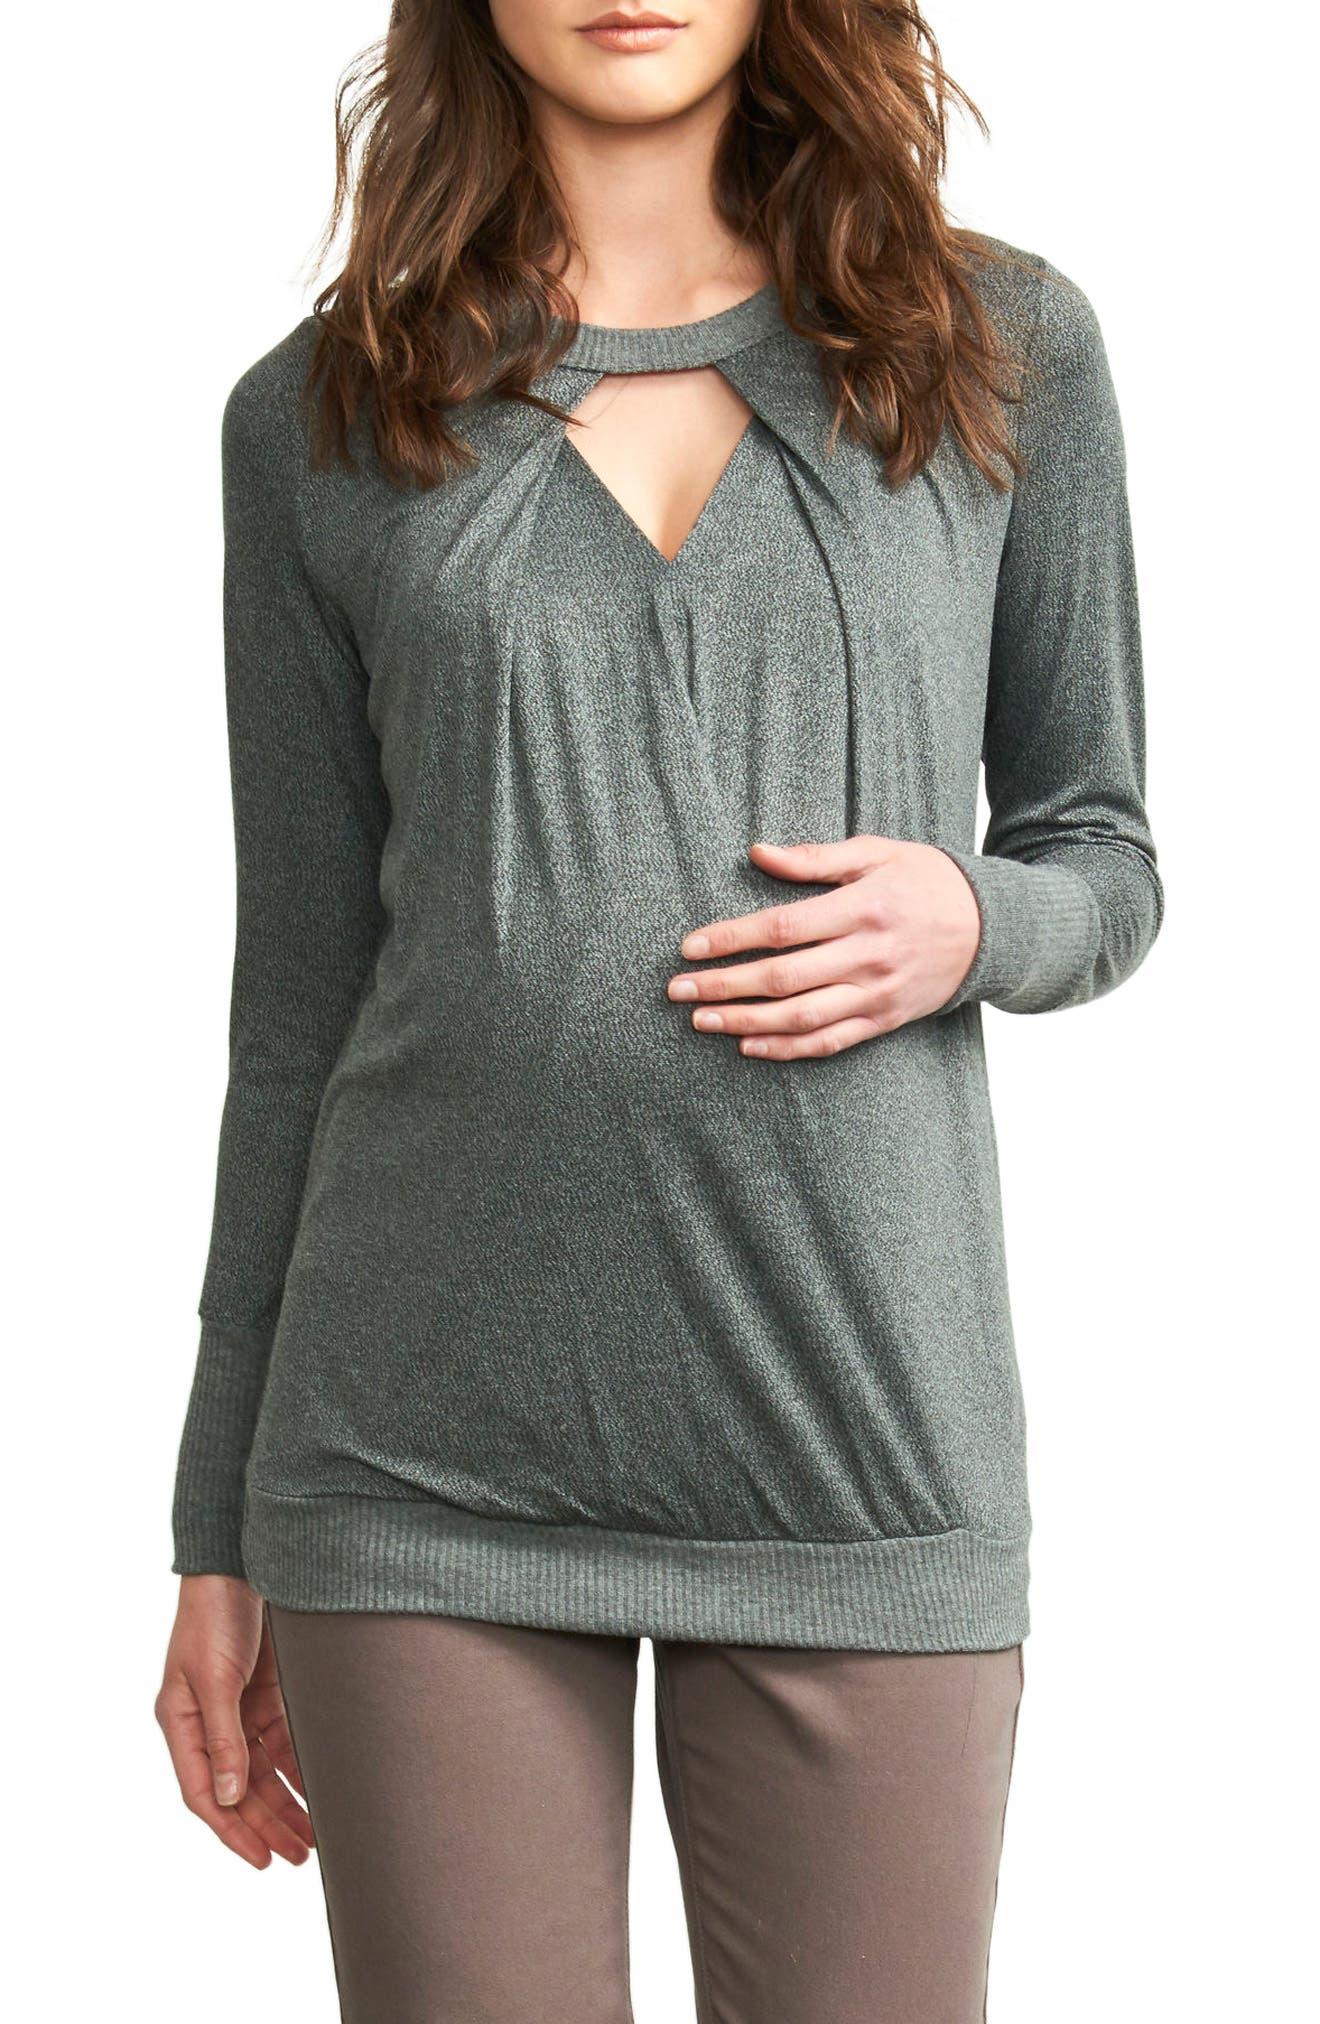 Main Image - Maternity America Keyhole Maternity Top